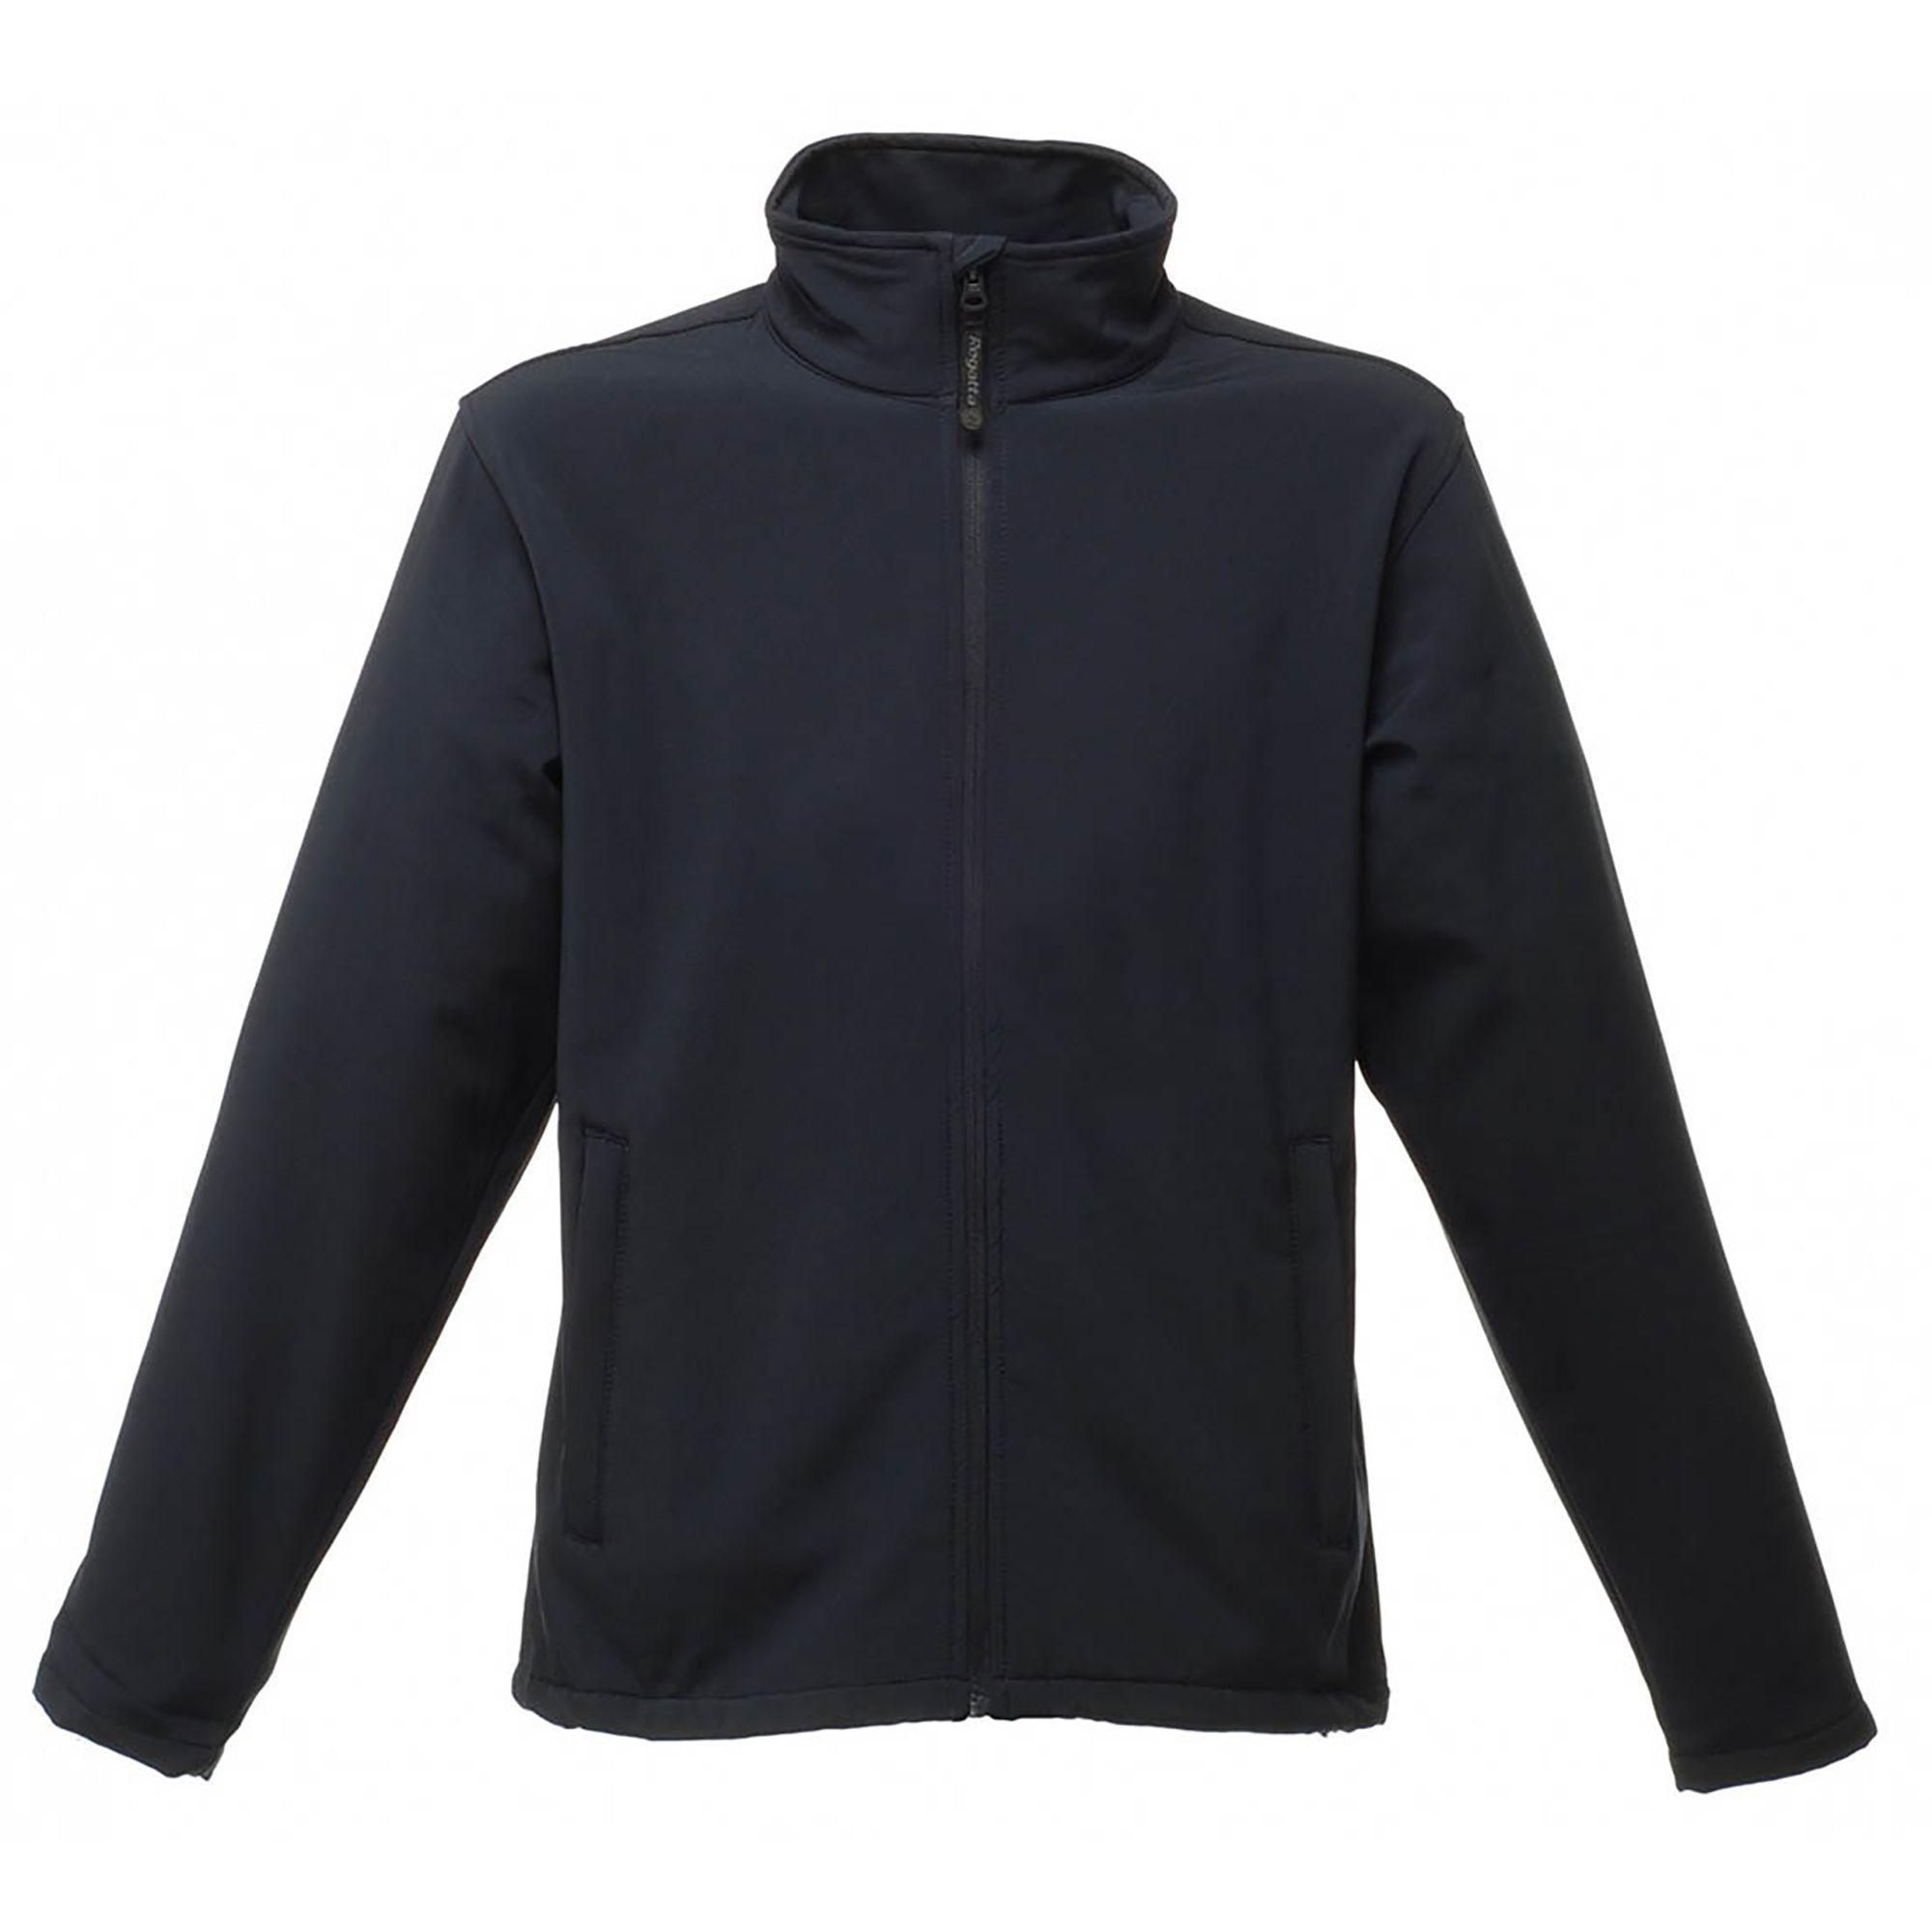 Regatta Reid Mens Softshell Wind Resistant Water Repellent Jacket